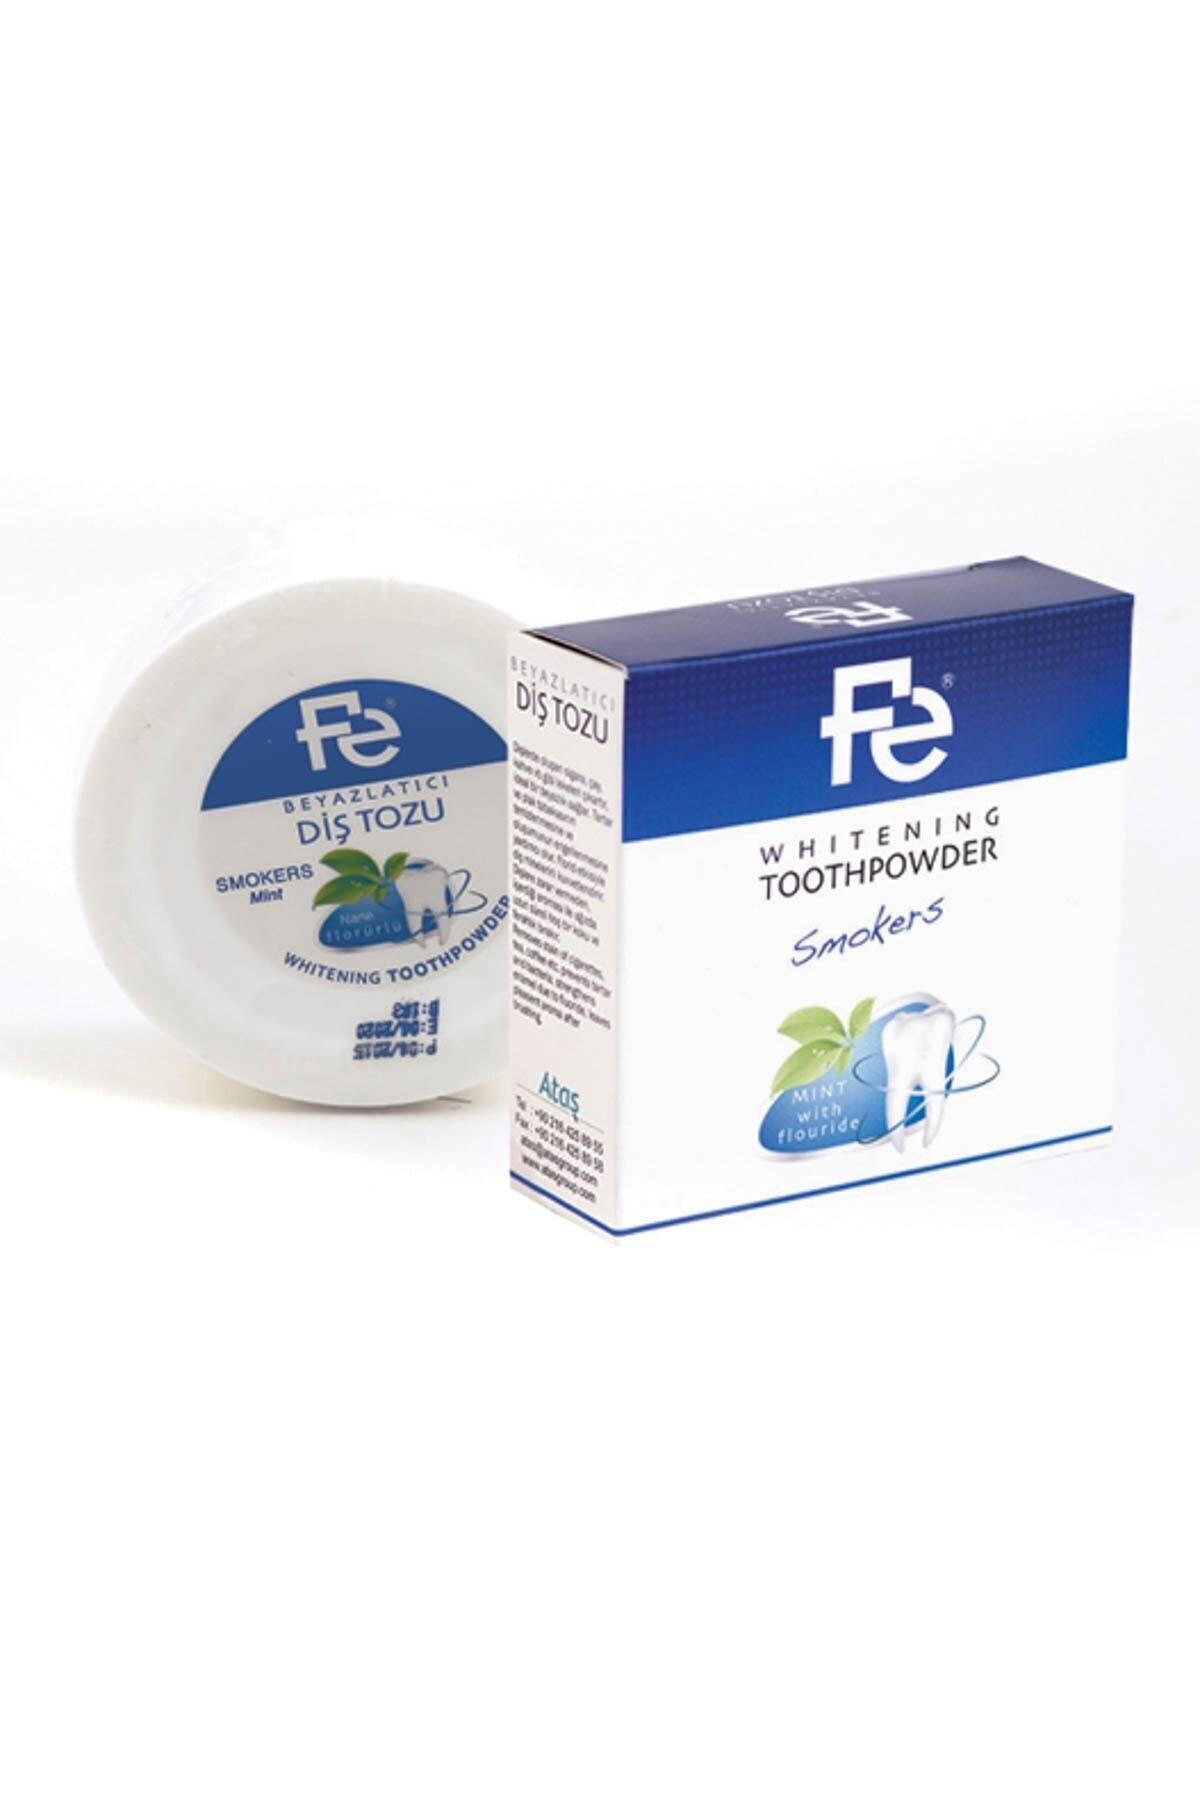 беговел baby care fivity mint Mint Whitening Tooth Powder-Mint Whitening Tooth Powder Tooth Cleaning Dental Care White Teeth Cleaning Kit